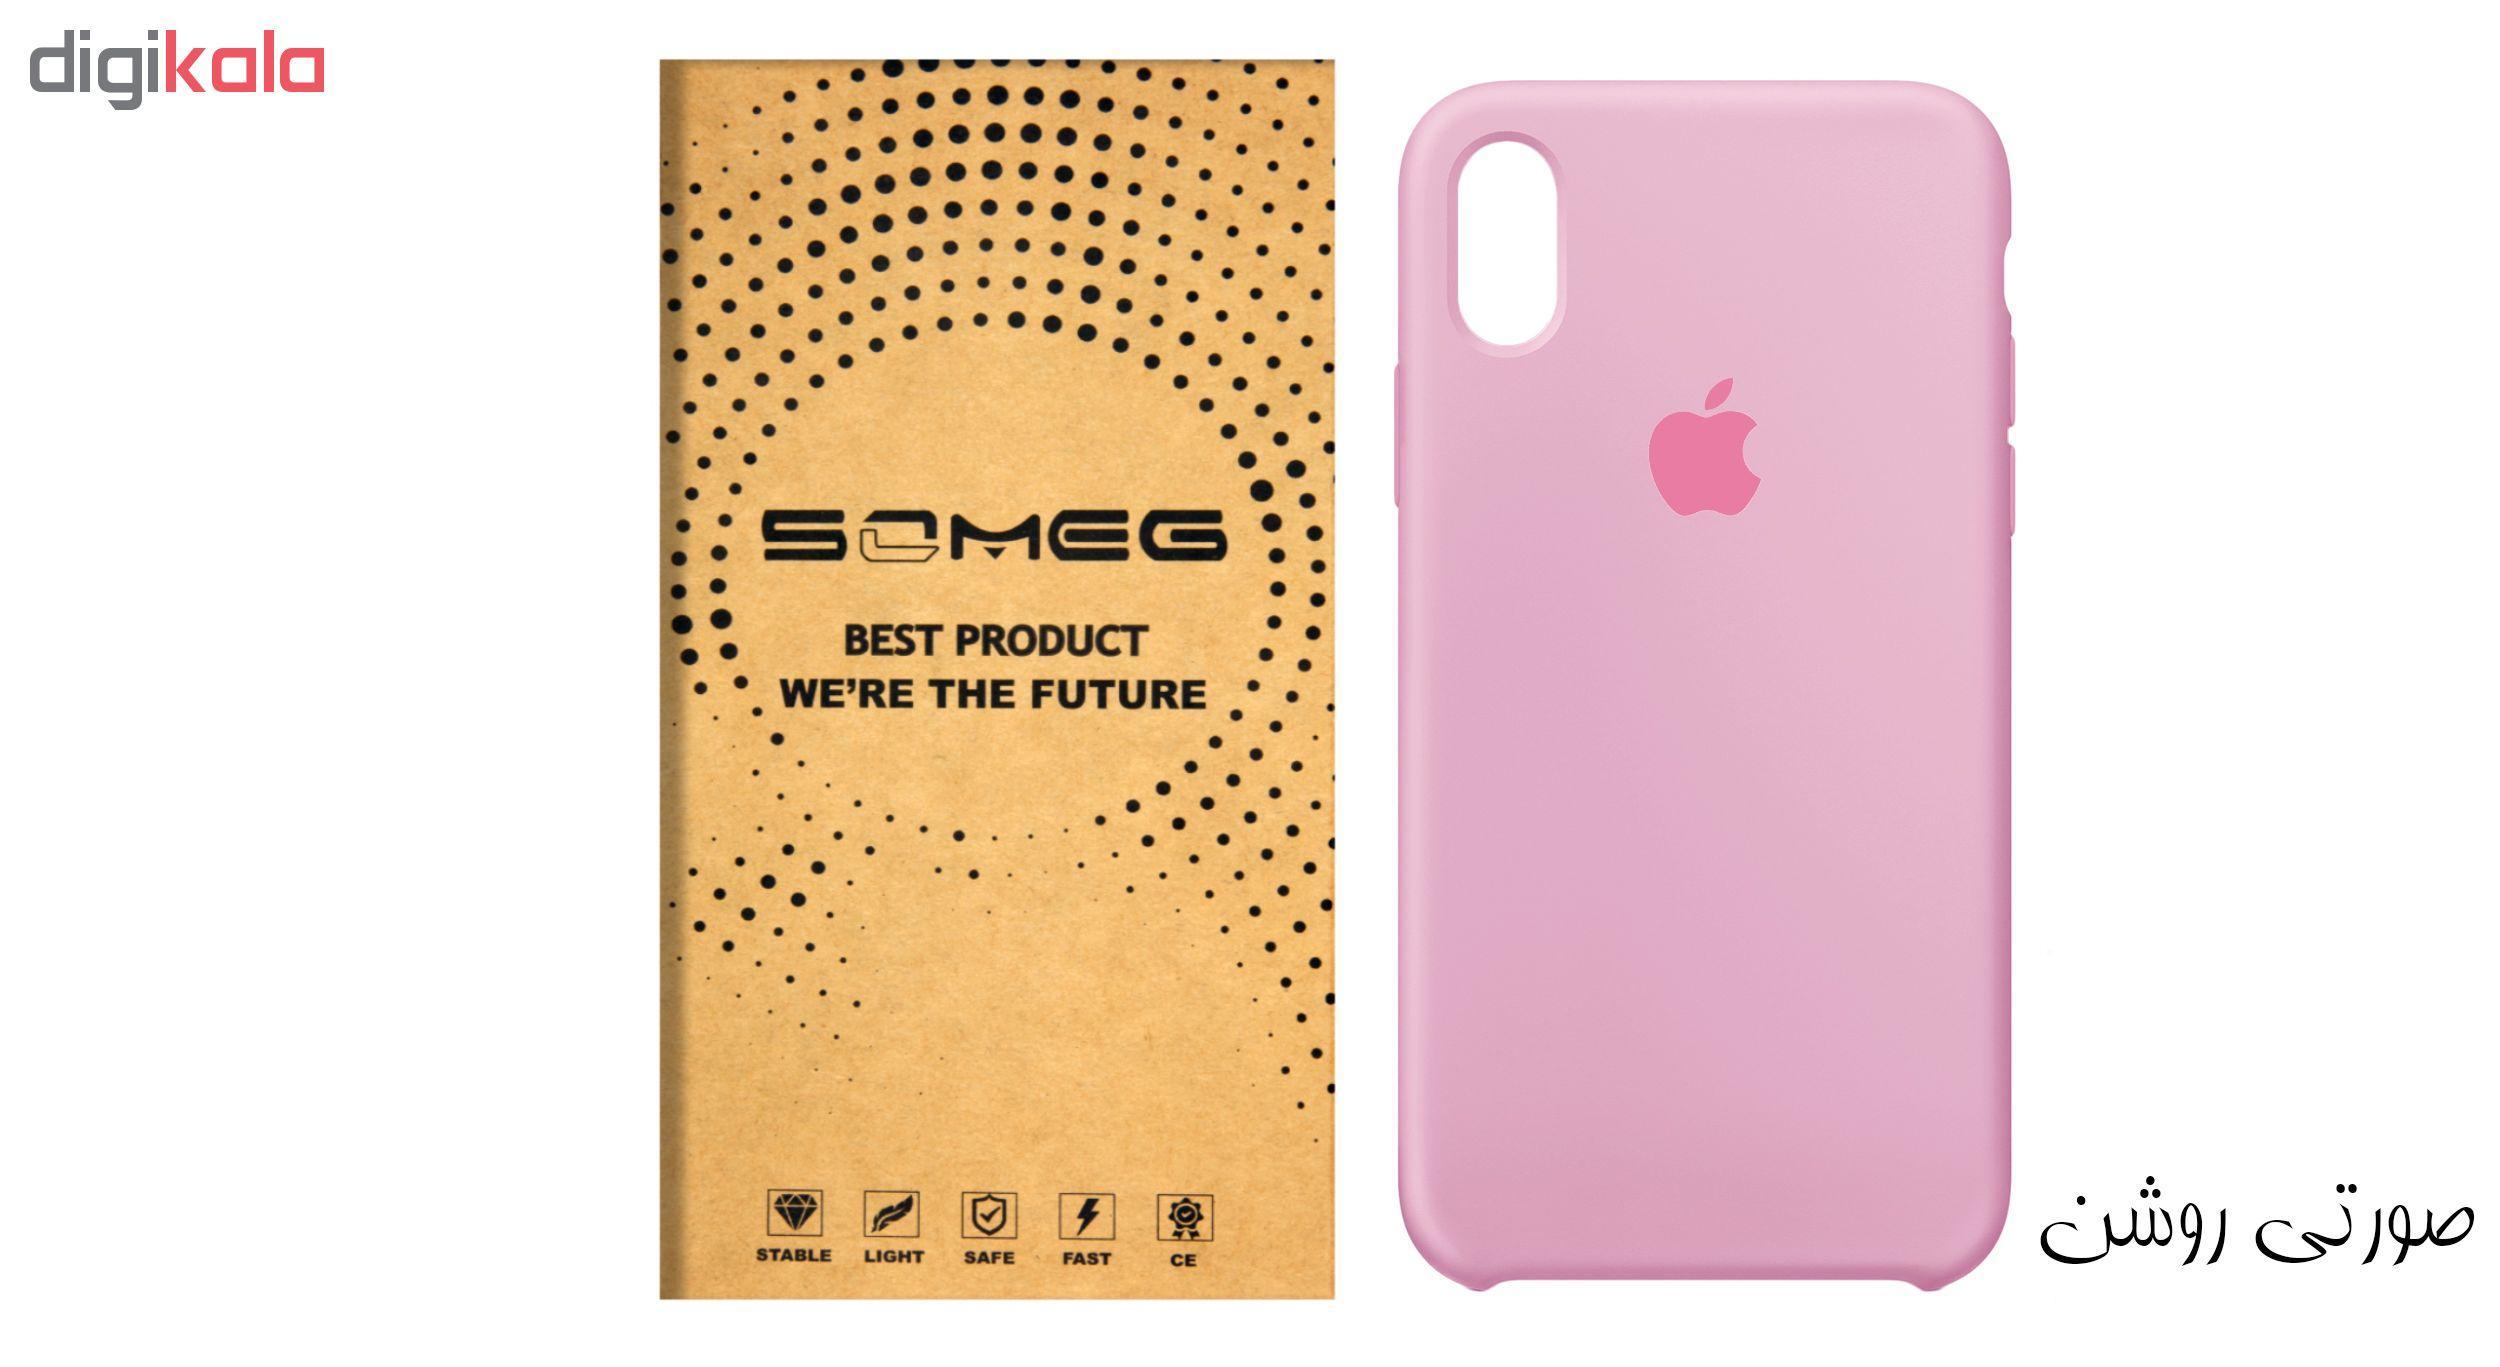 کاور سومگ مدل SIC مناسب برای گوشی موبایل اپل iPhone X  main 1 19